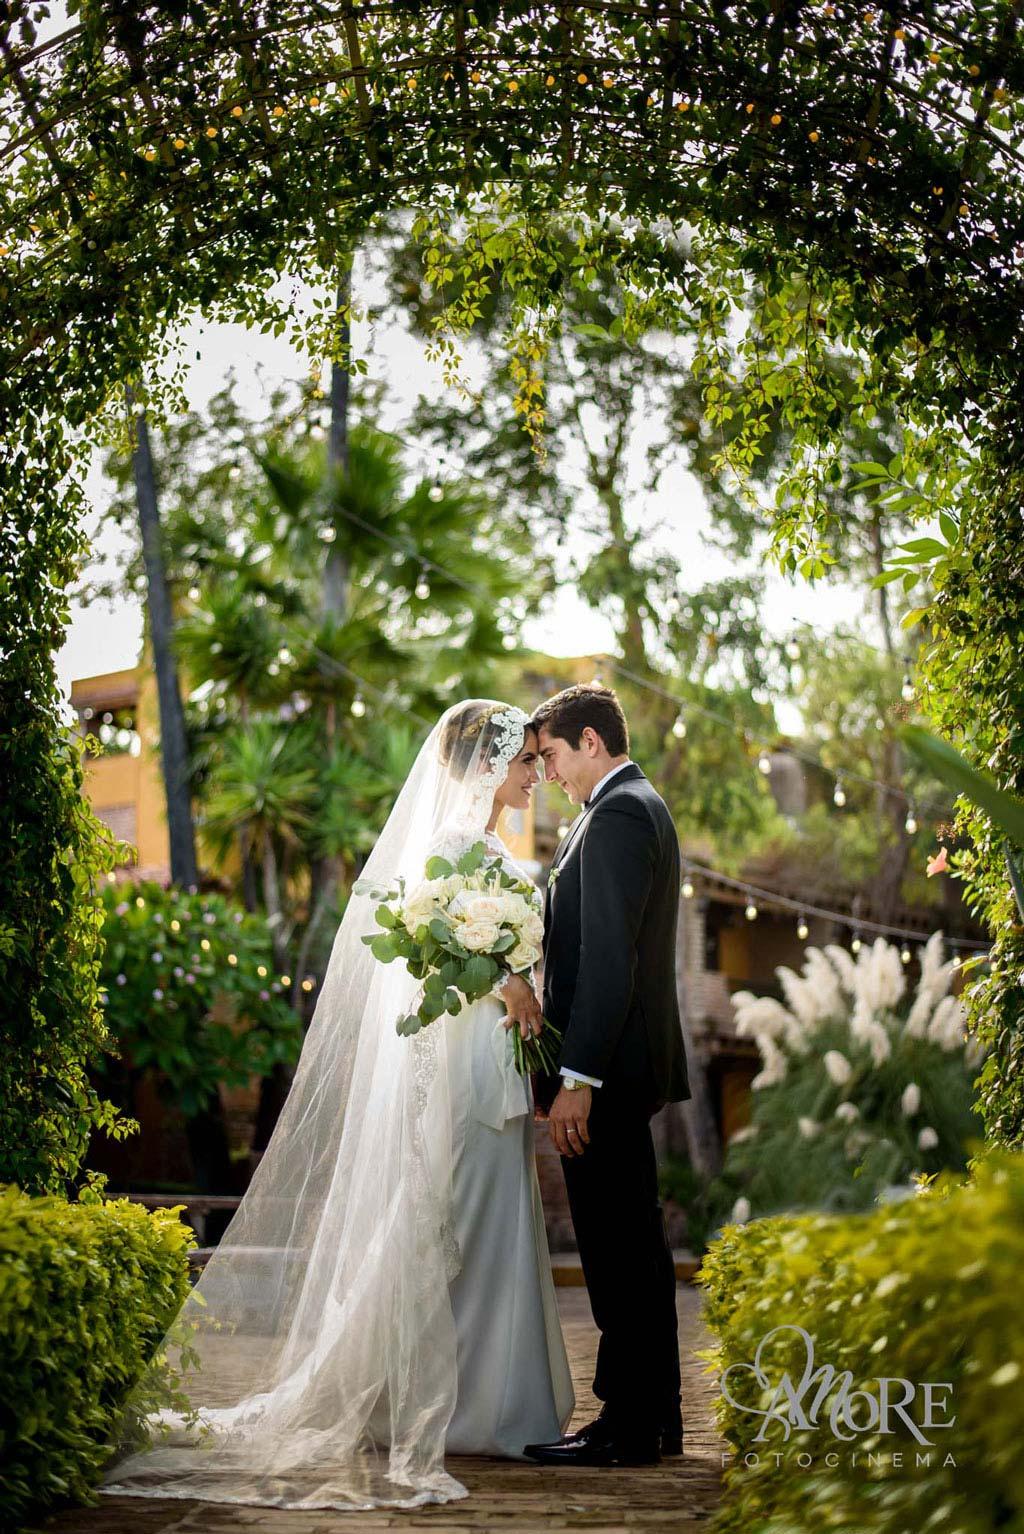 Fotografia de bodas en Tlaquepaque Jalisco